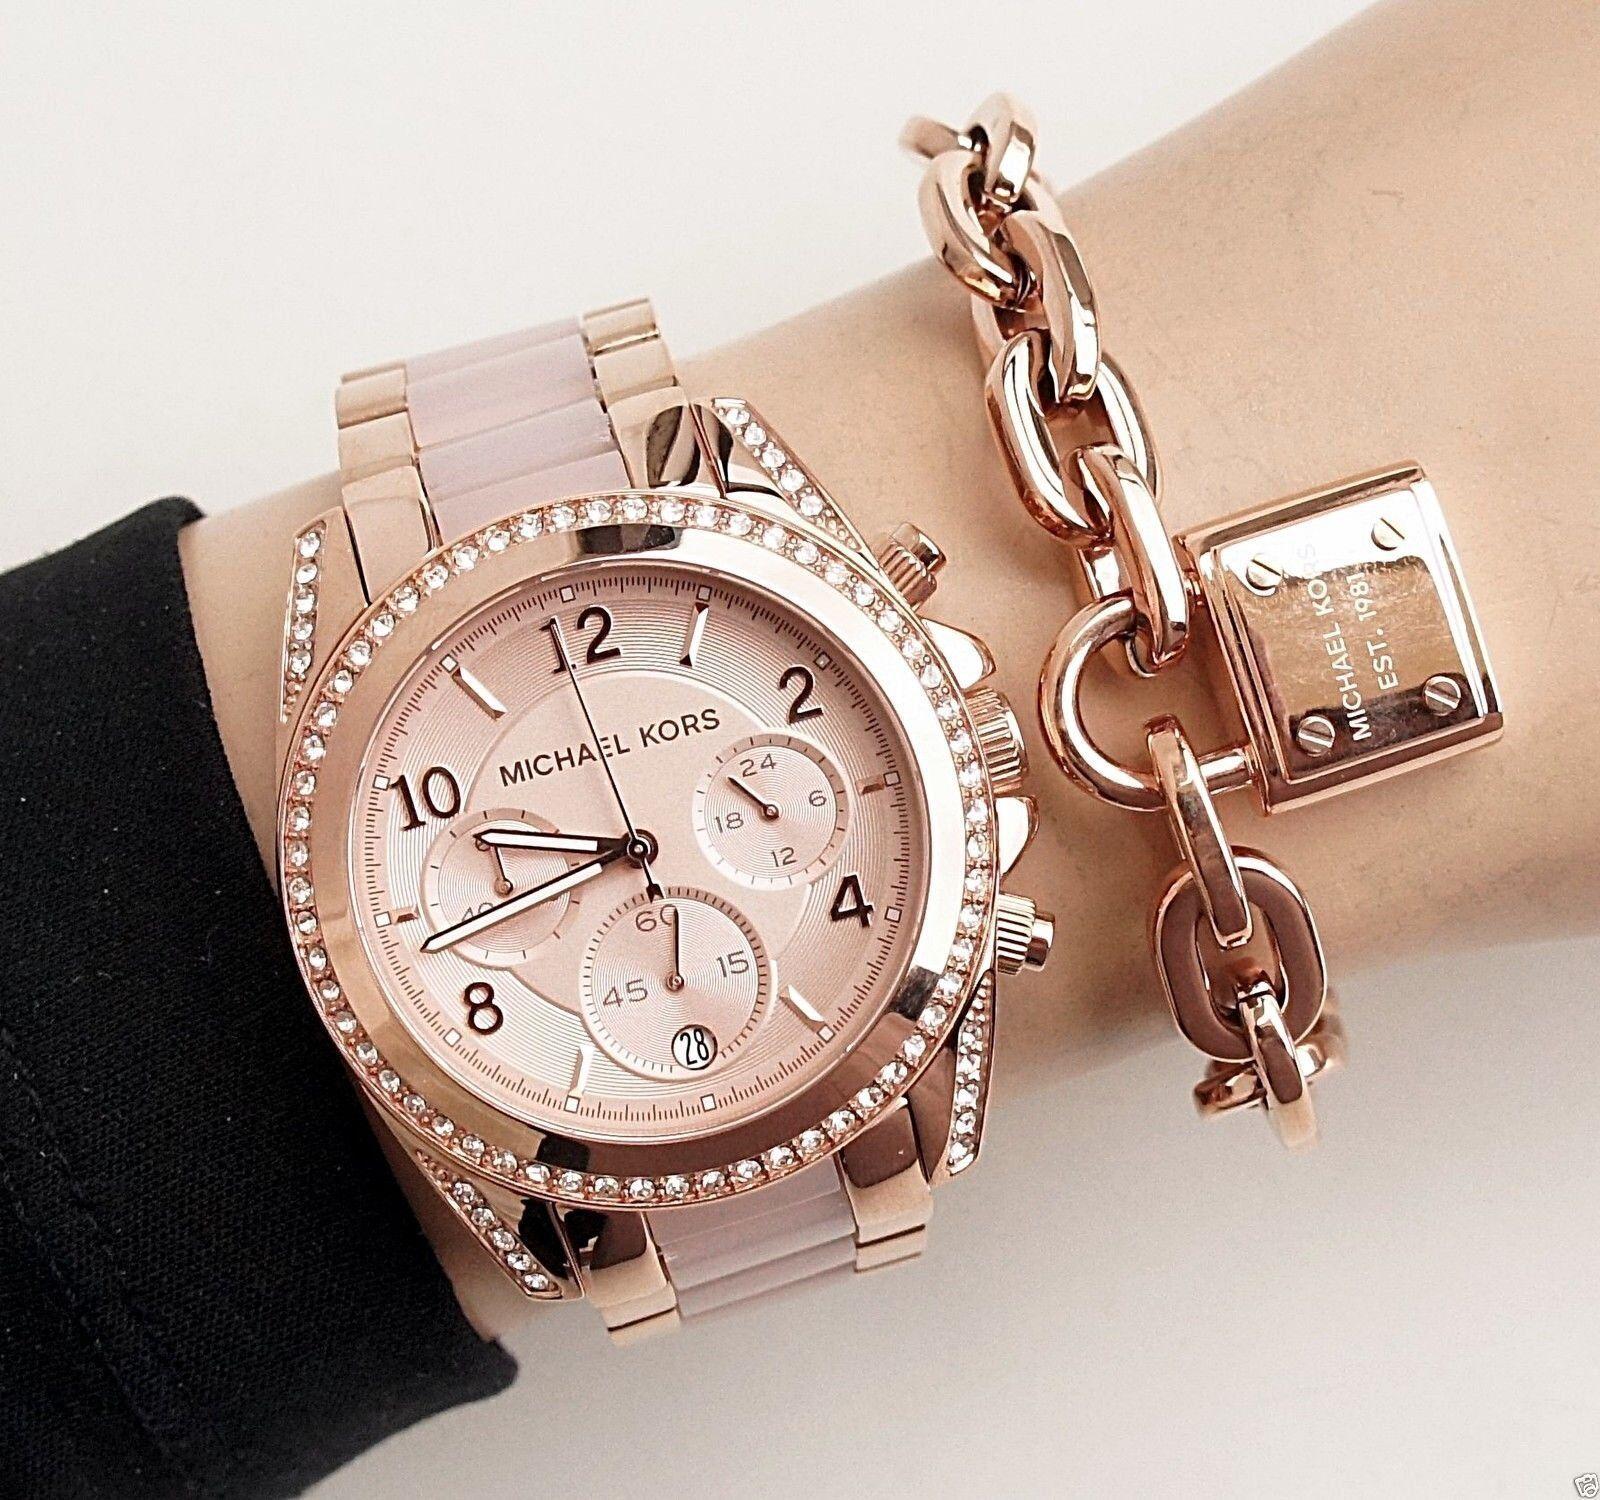 Michael Kors - Michael Kors Women's Blair Chrono 100m Rose Gold Stainless Steel Watch MK5943